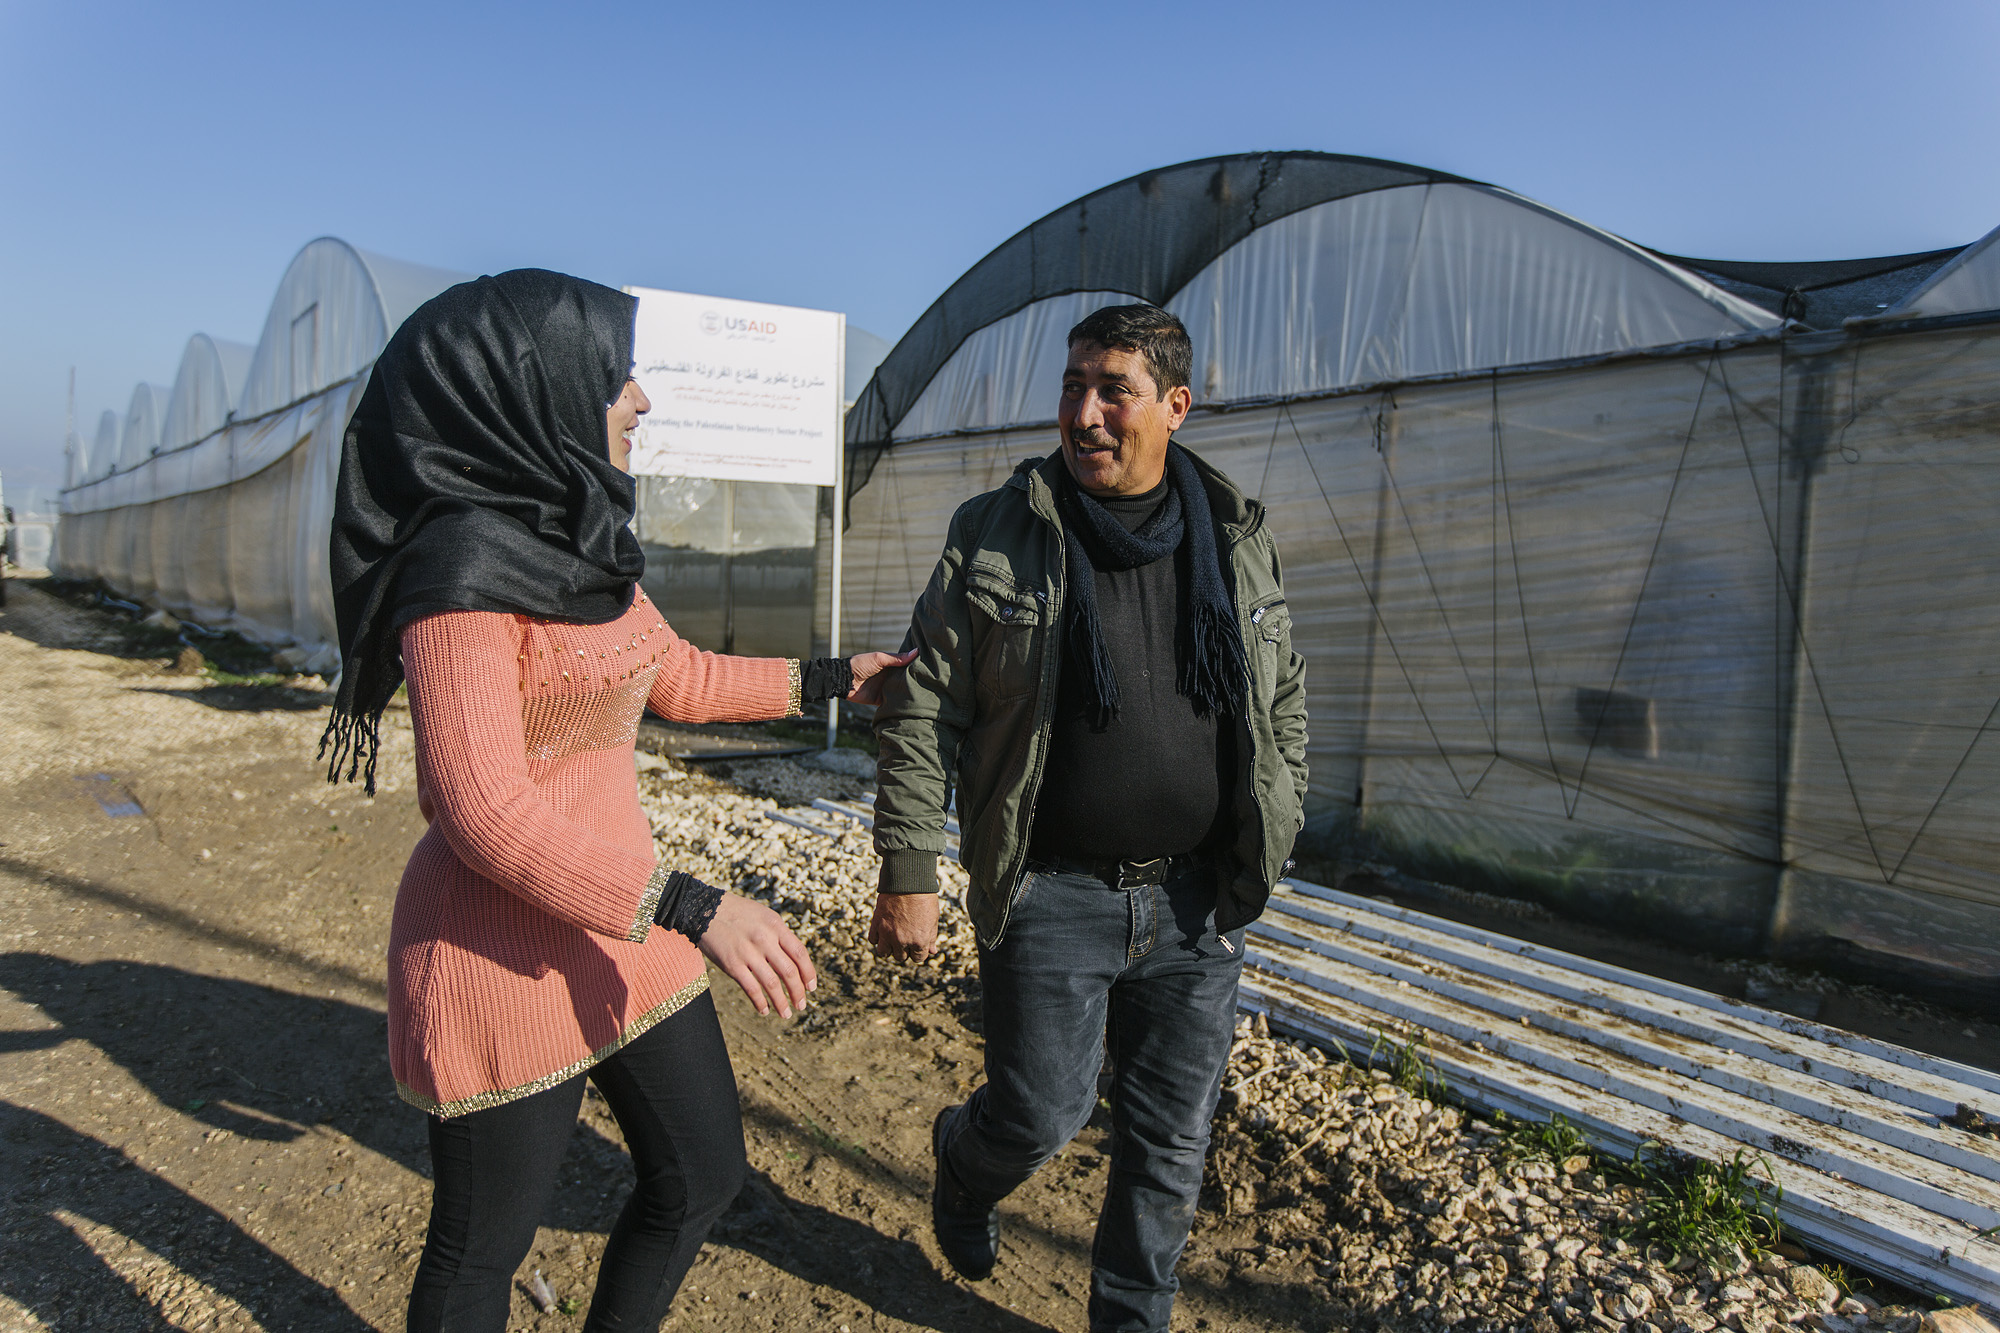 USAID-Israel-Day5-Strawberries-_07A7890.jpg